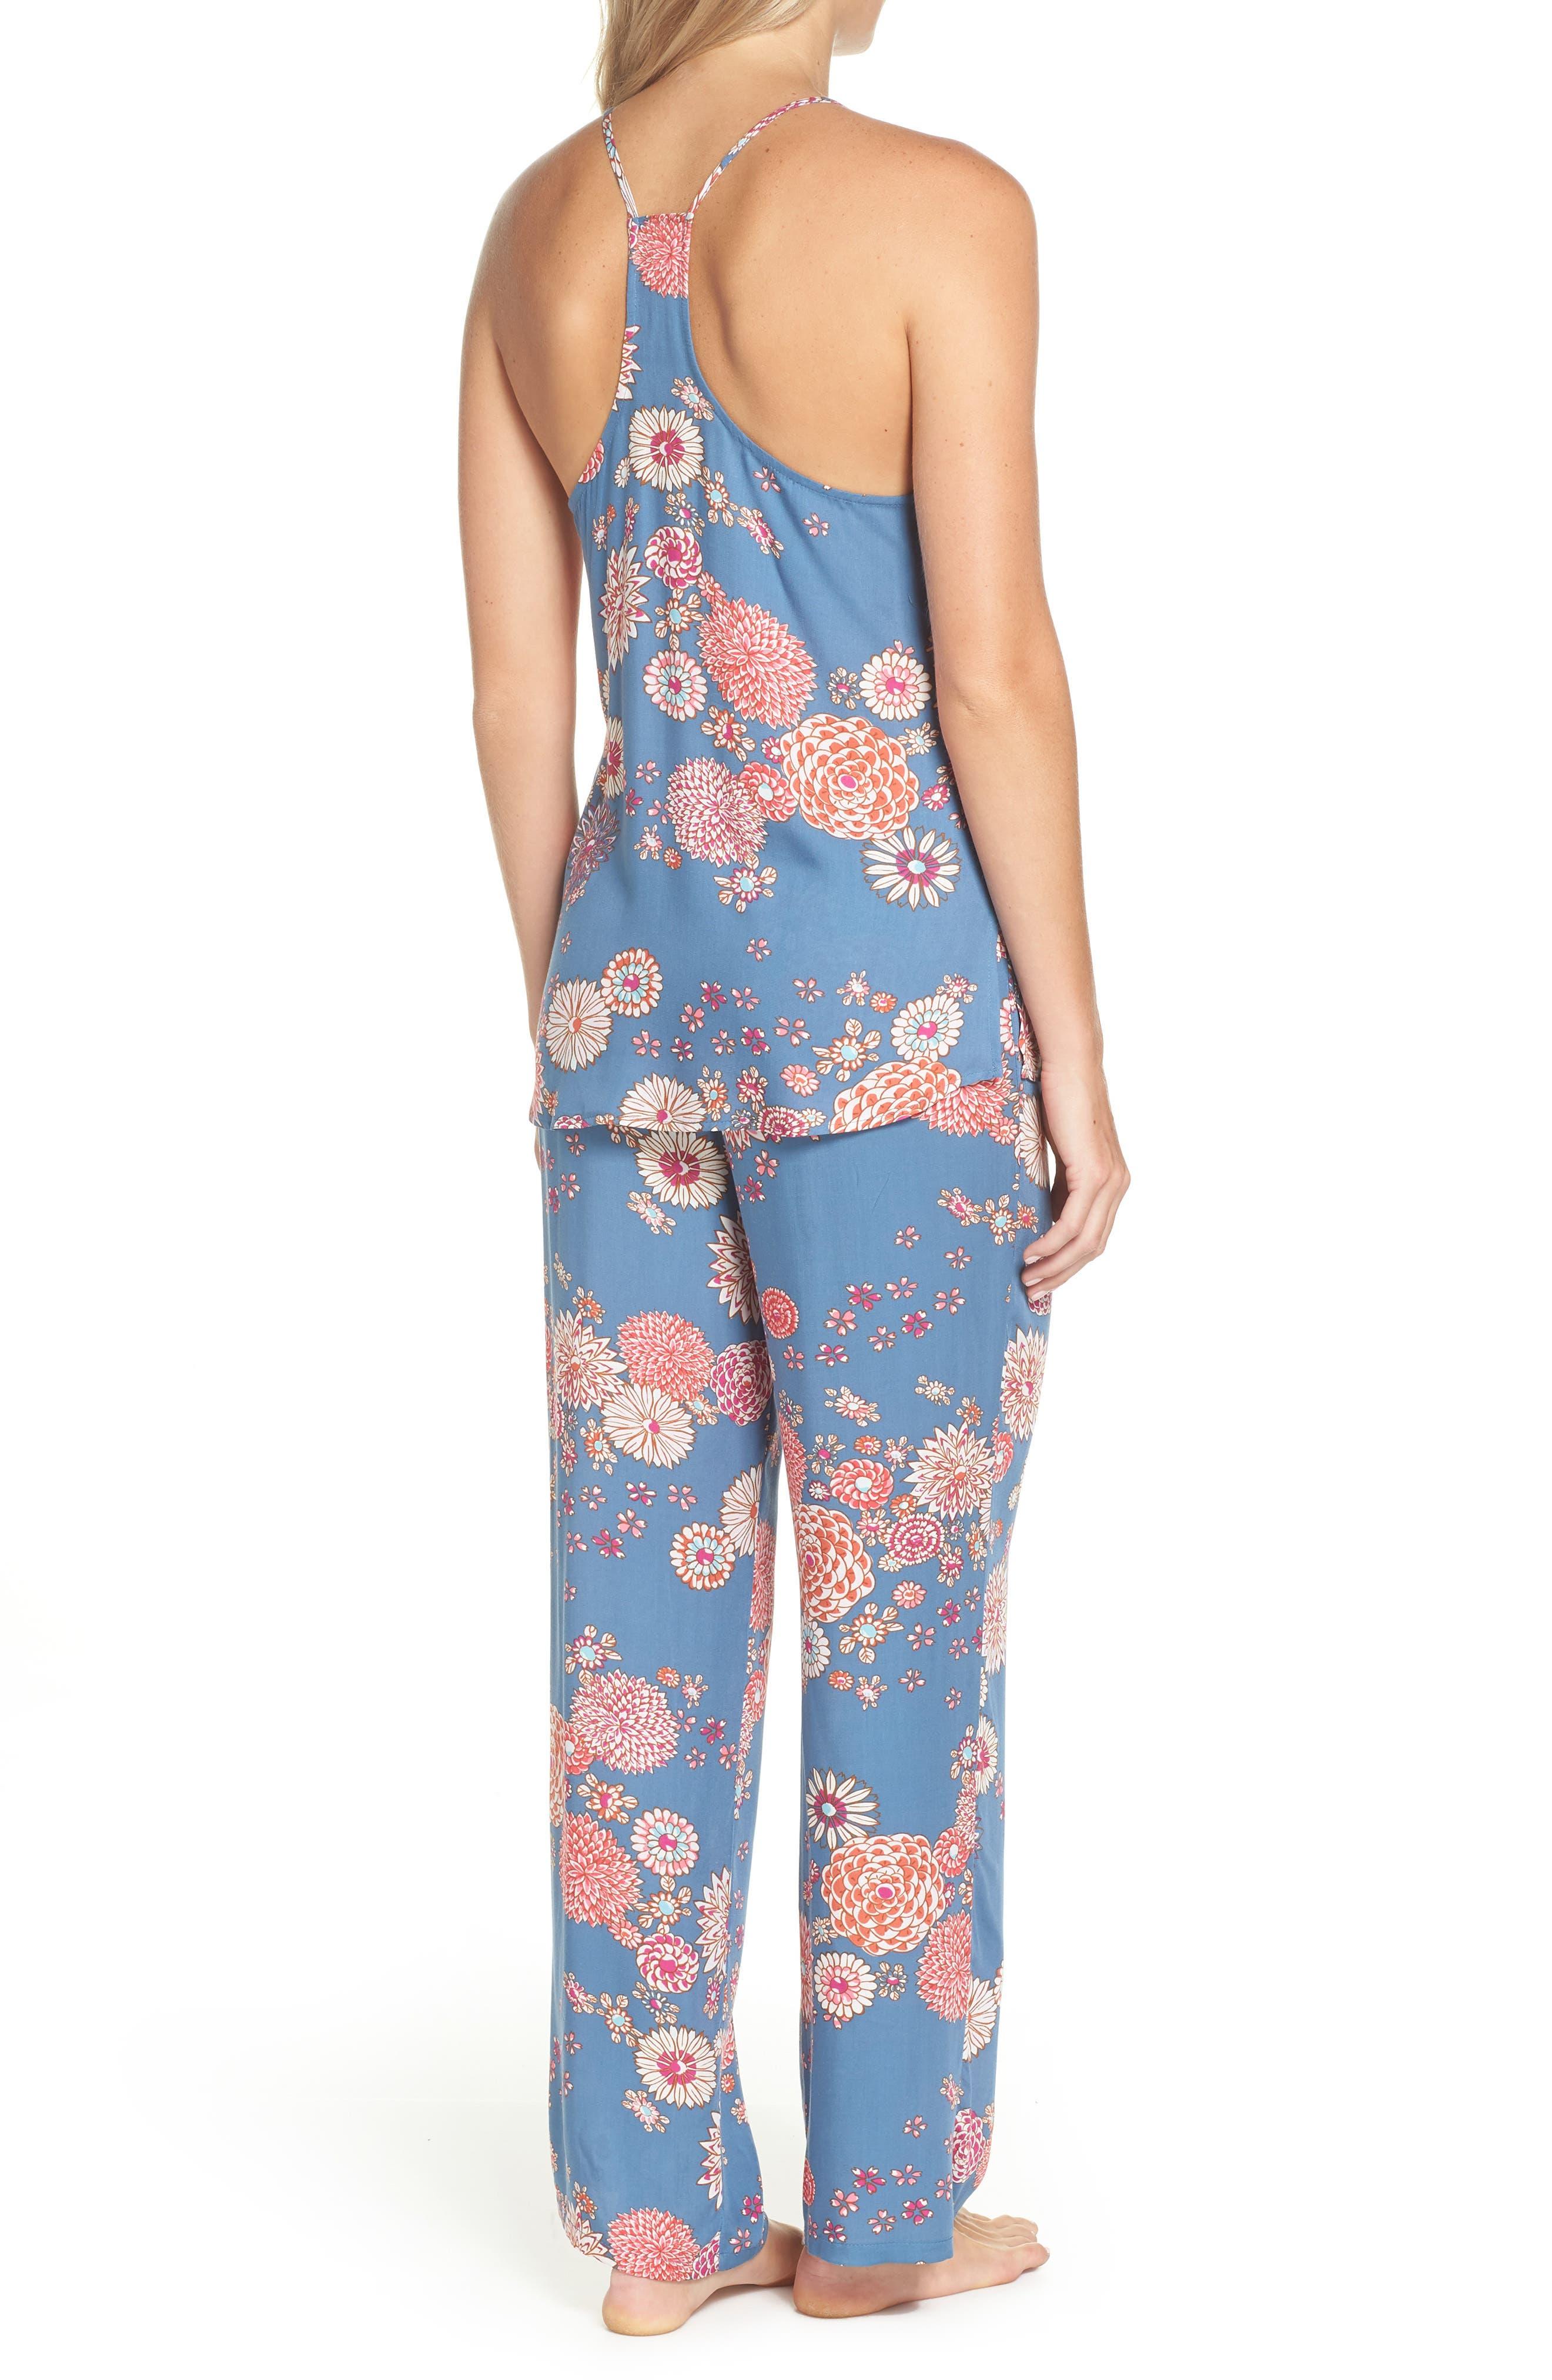 Floral Pajamas,                             Alternate thumbnail 2, color,                             Steallar Blue